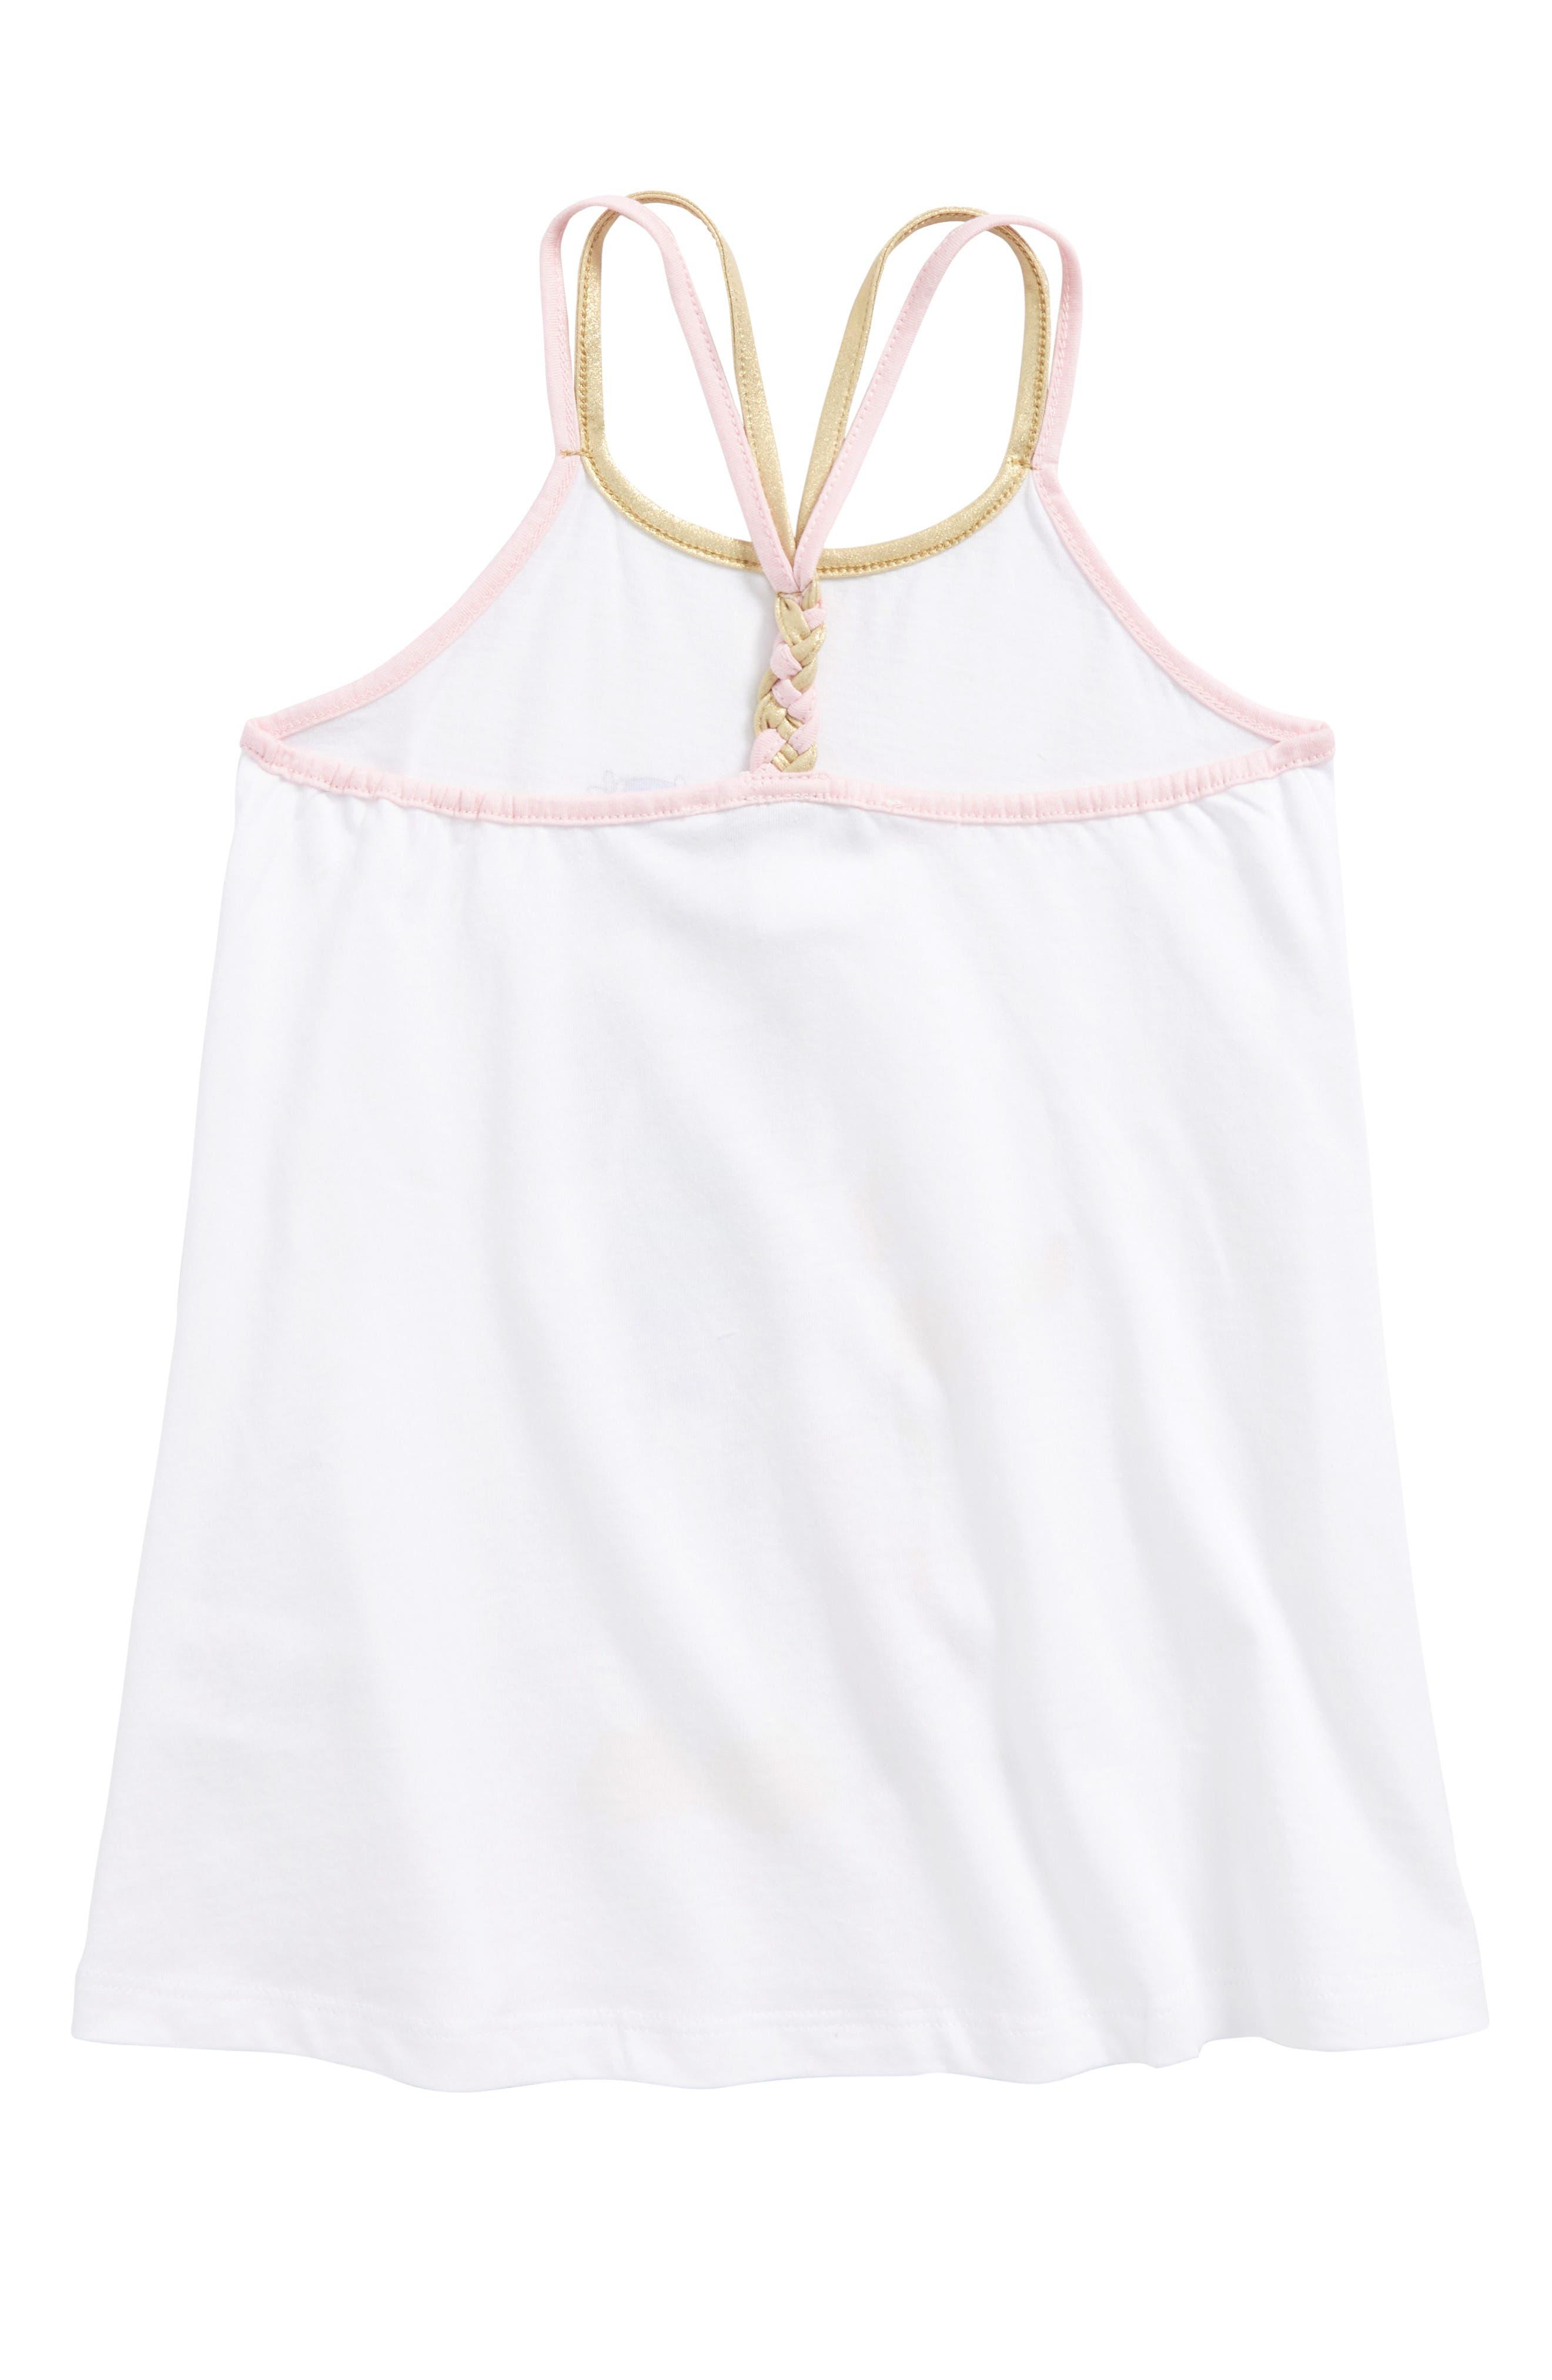 Miss Marc Beach Tank Dress,                             Alternate thumbnail 2, color,                             100